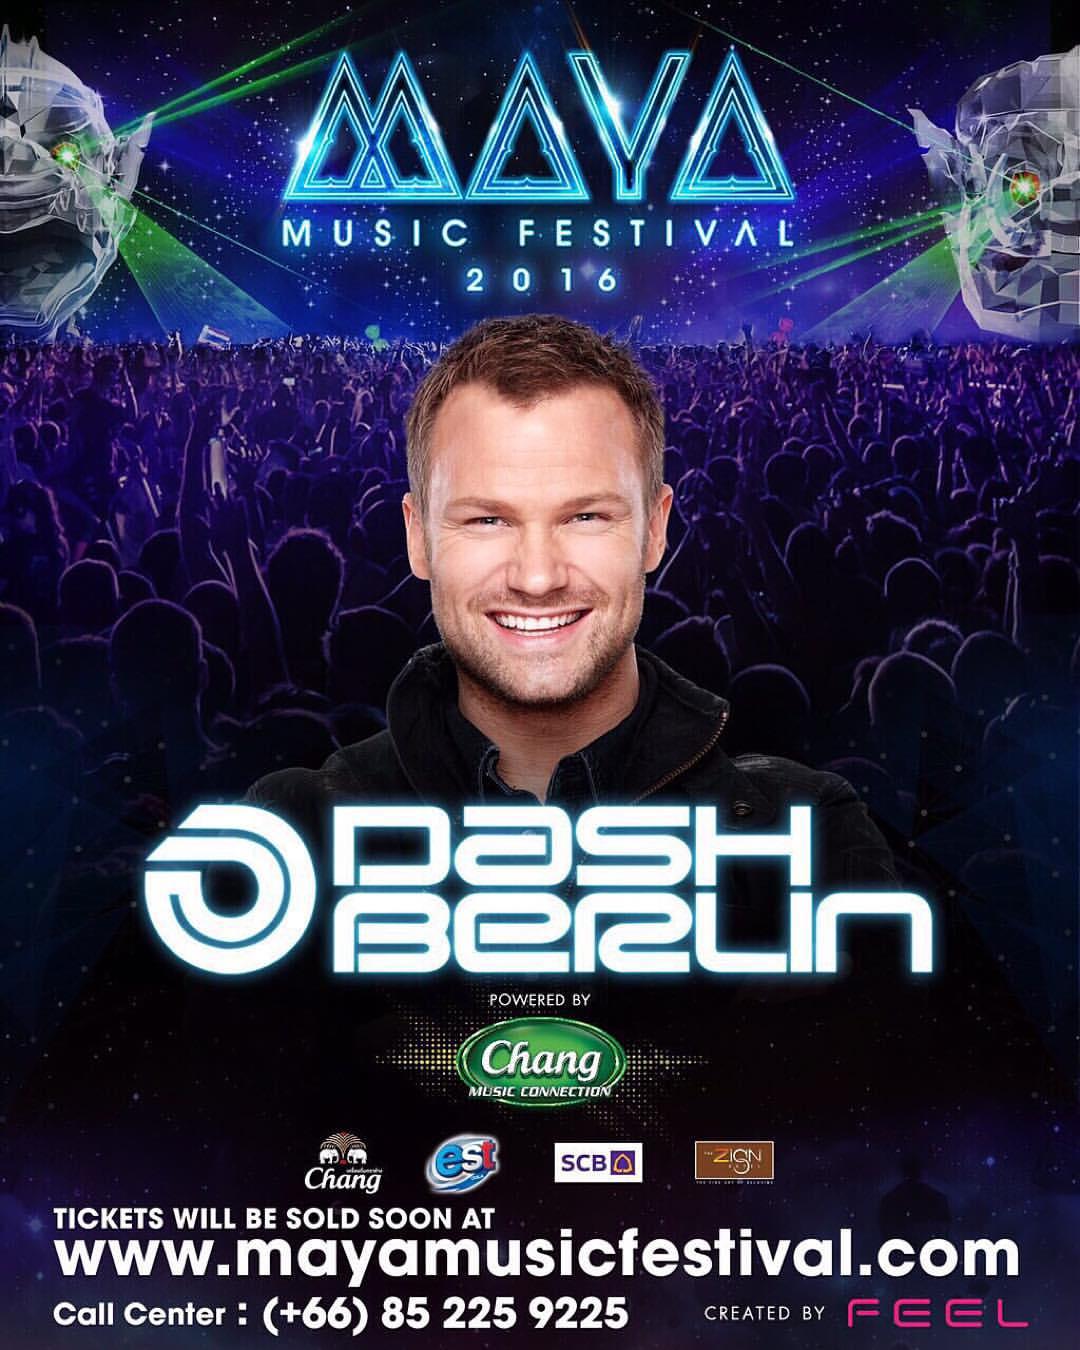 MAYA Music festival   Dash Berlin